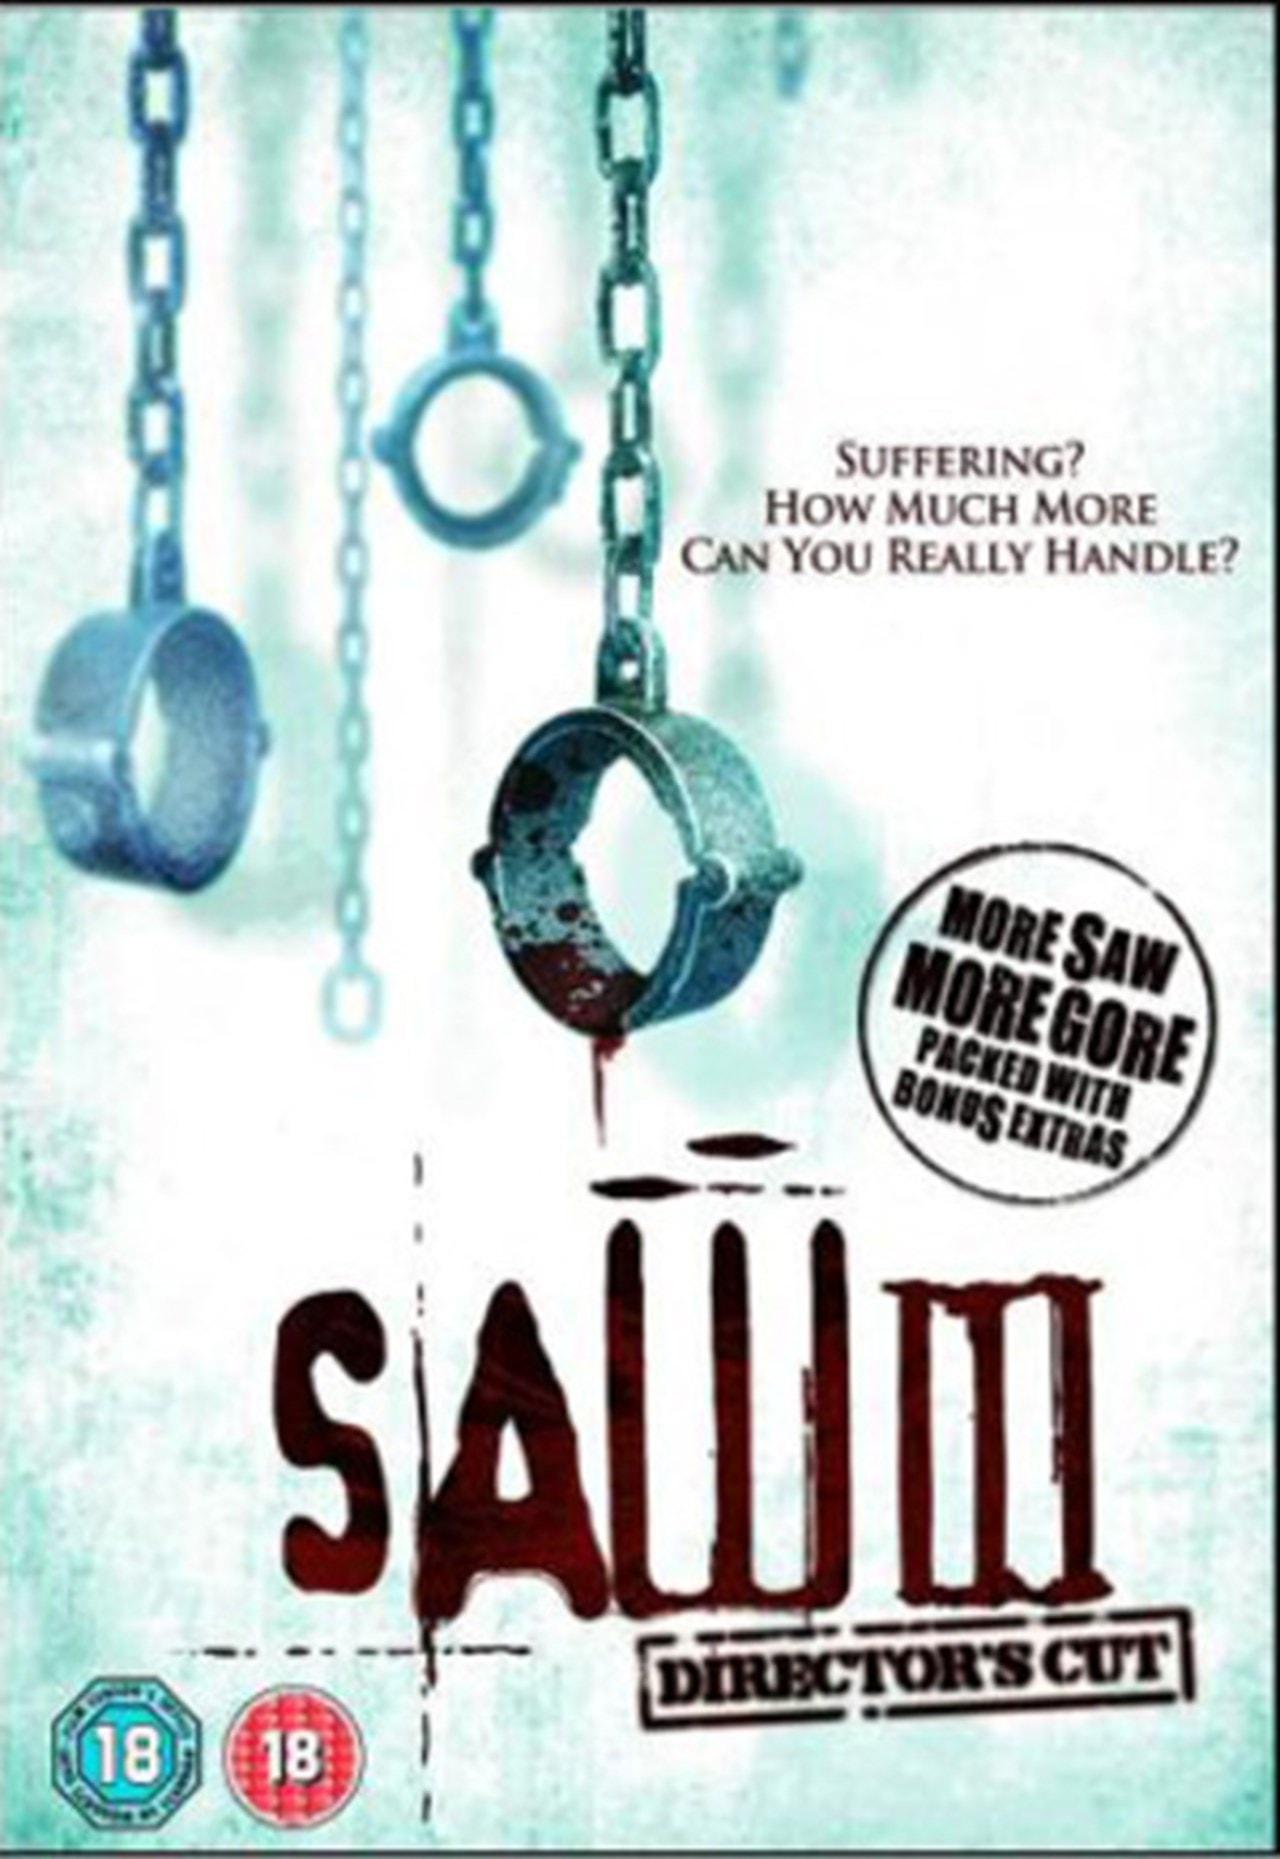 Saw III: Director's Cut - 1